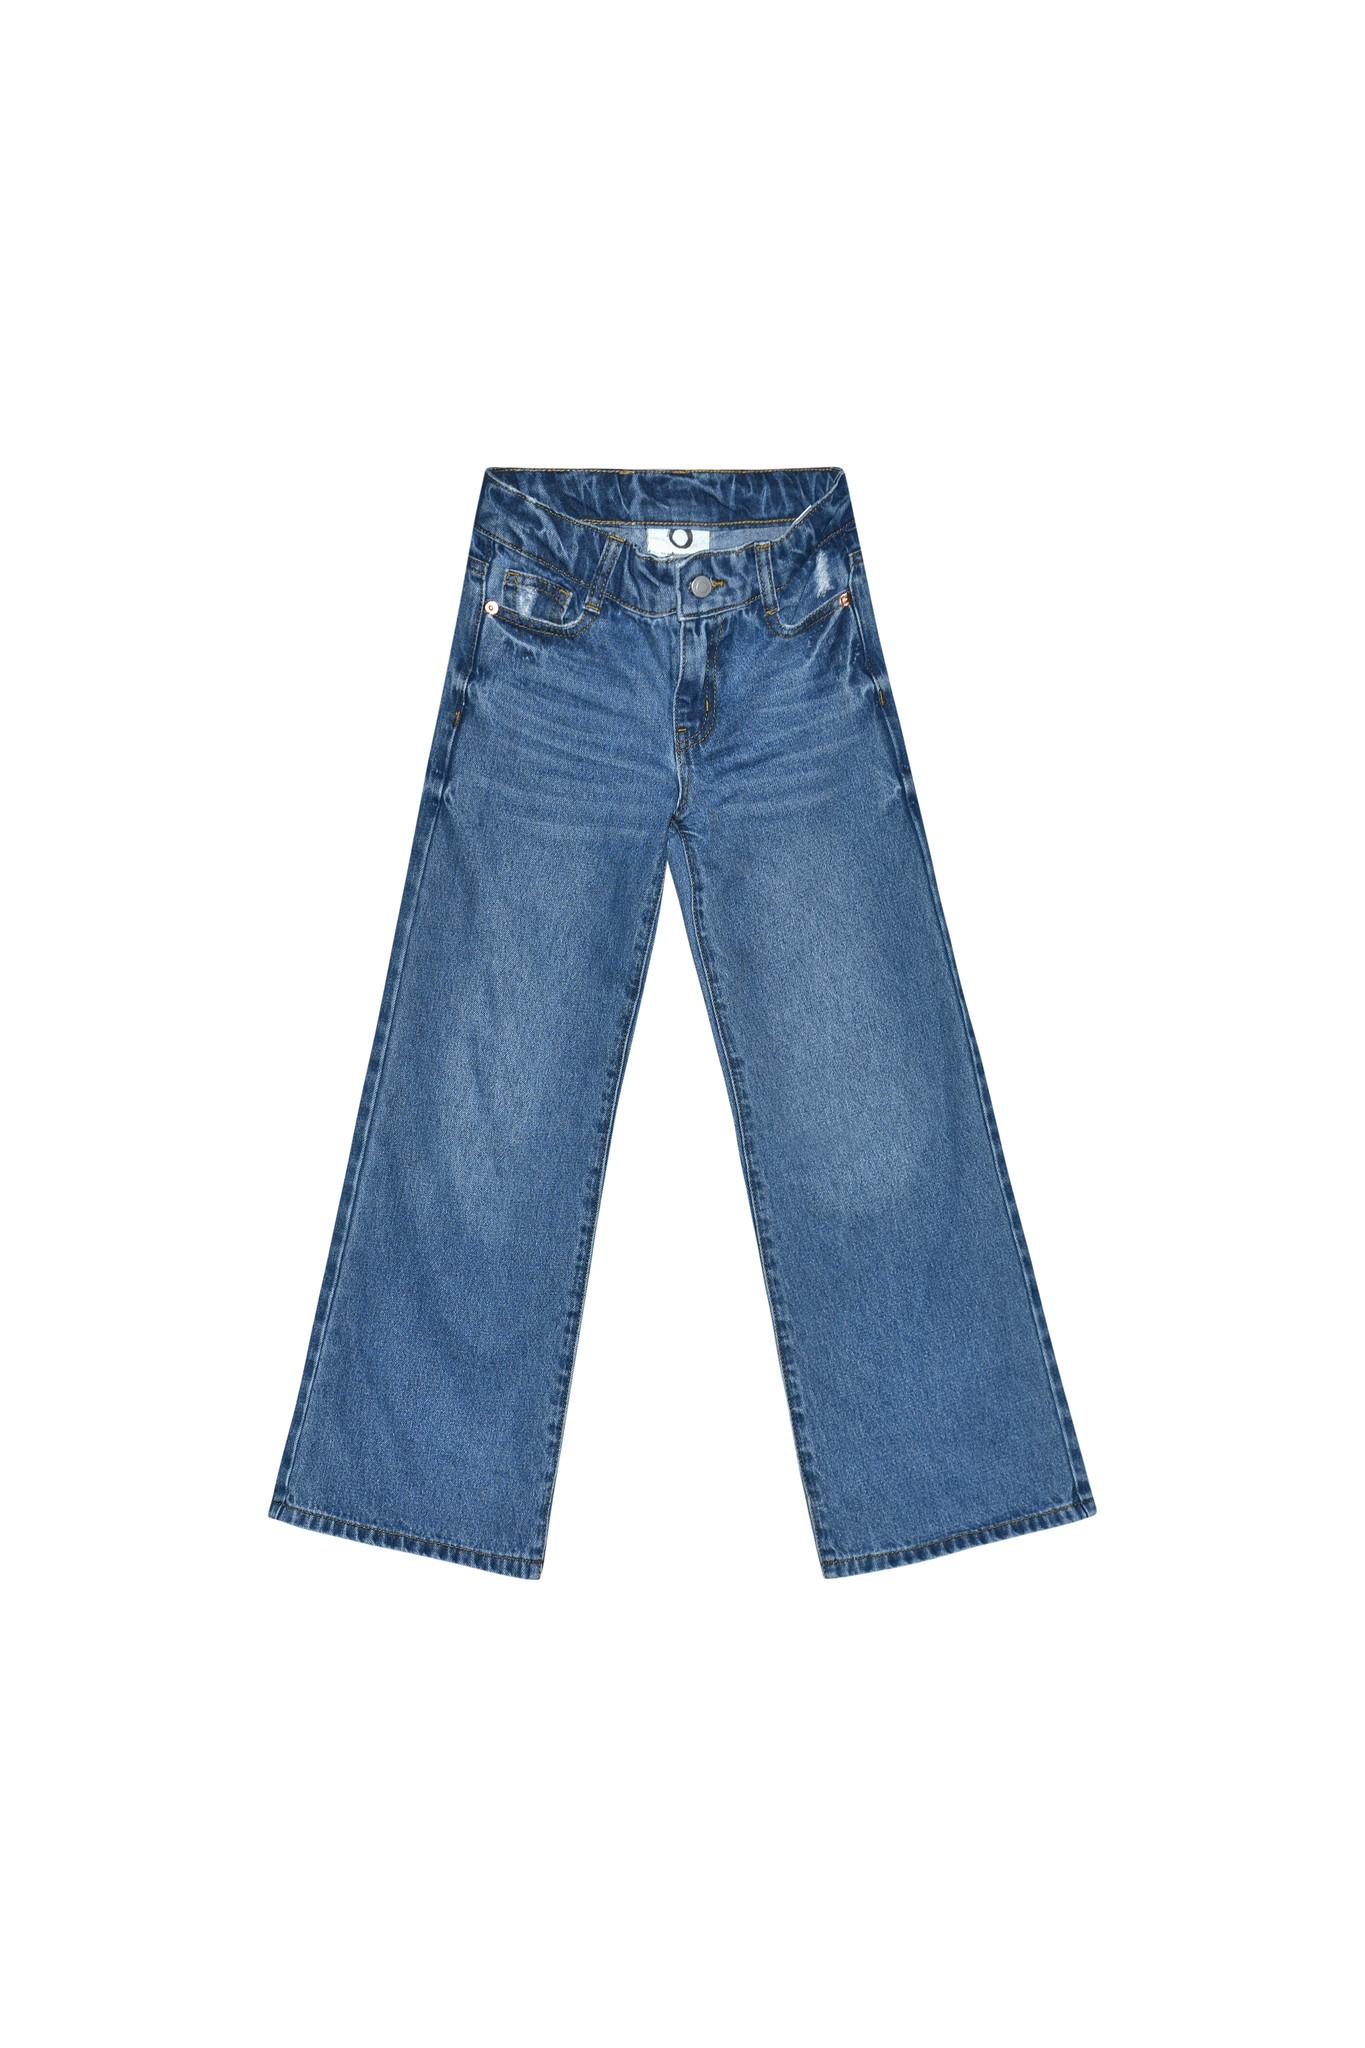 Stiles wide jeans-1